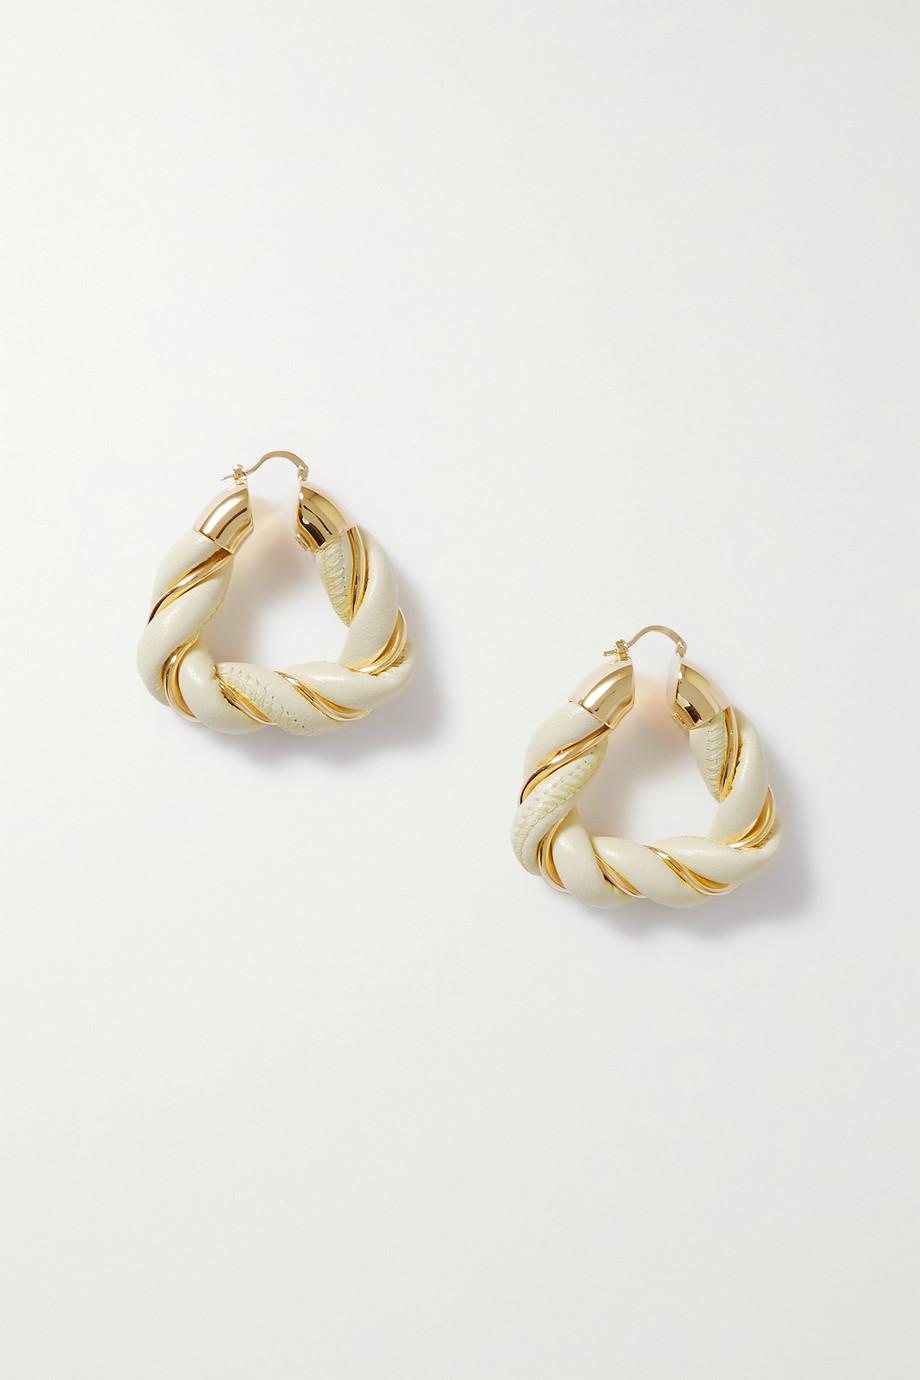 Bottega Veneta Square Twist vergoldete Ohrringe mit Details aus Leder